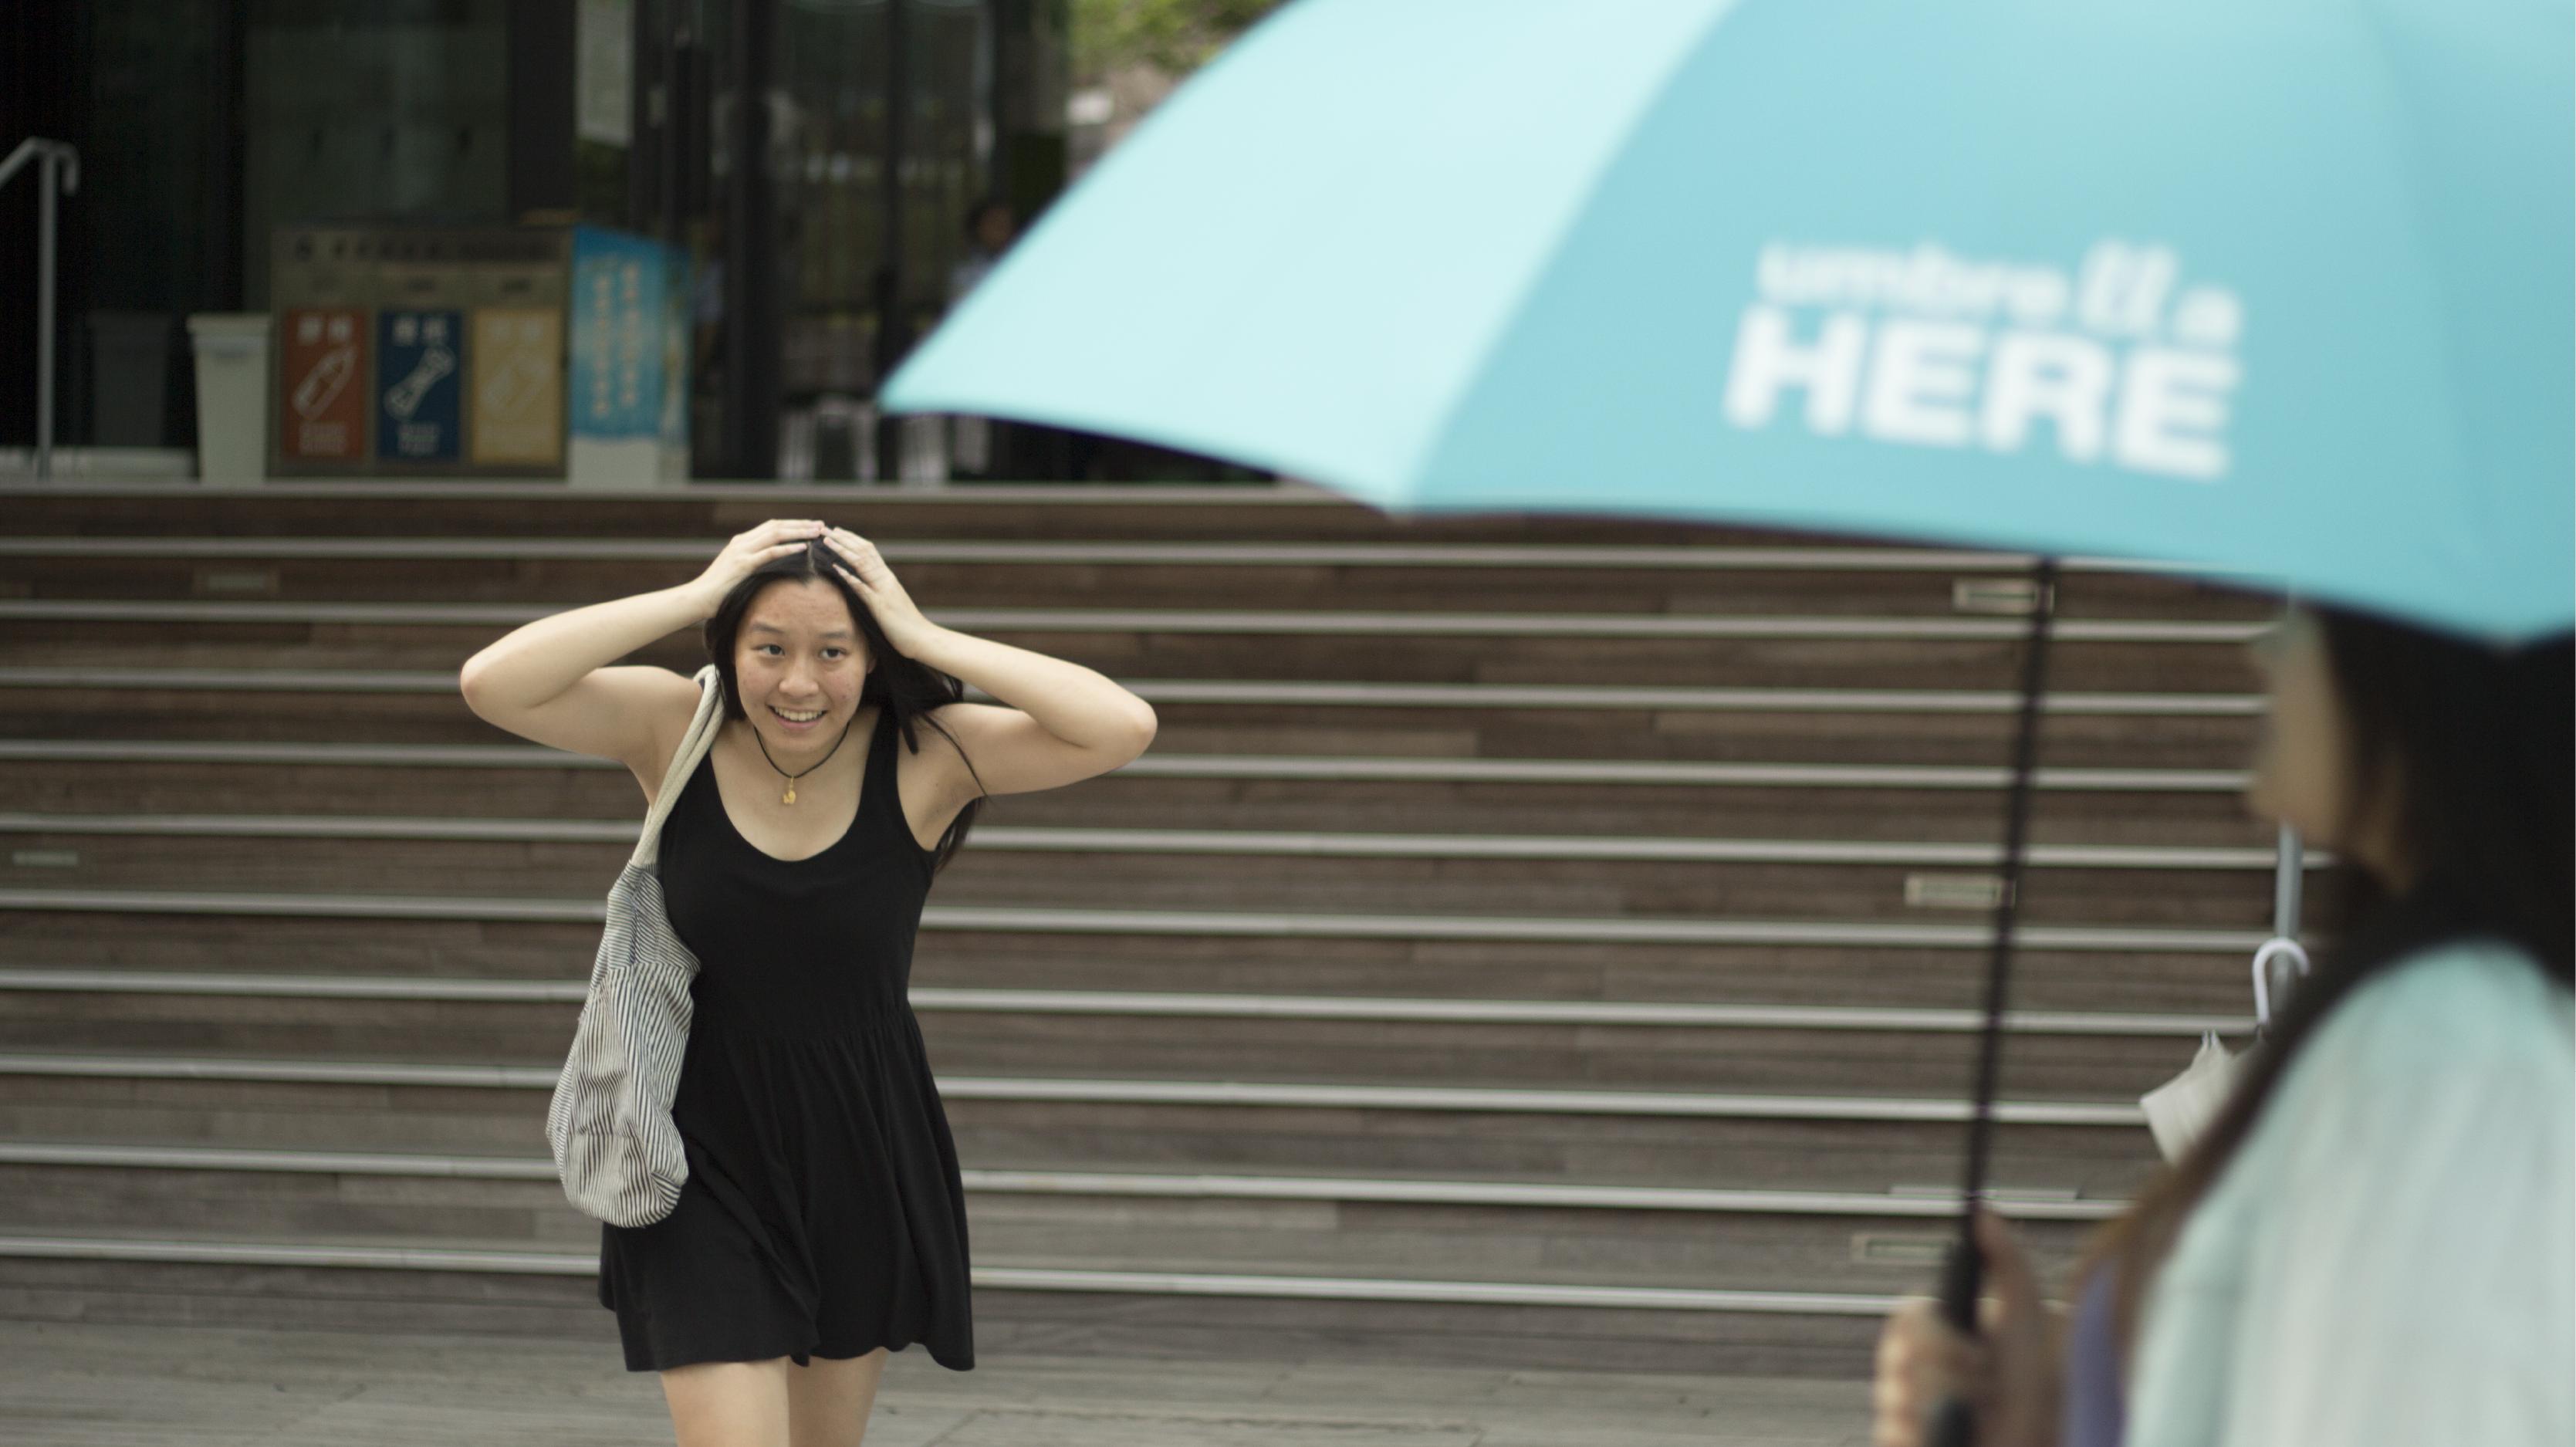 Umbrella Here | Light your umbrella for sharing. #UmbrellaHere #design #interaction #sharing #light  Support us on Kickstarter! https://www.kickstarter.com/projects/1369020620/umbrella-here-light-up-your-umbrella-for-sharing